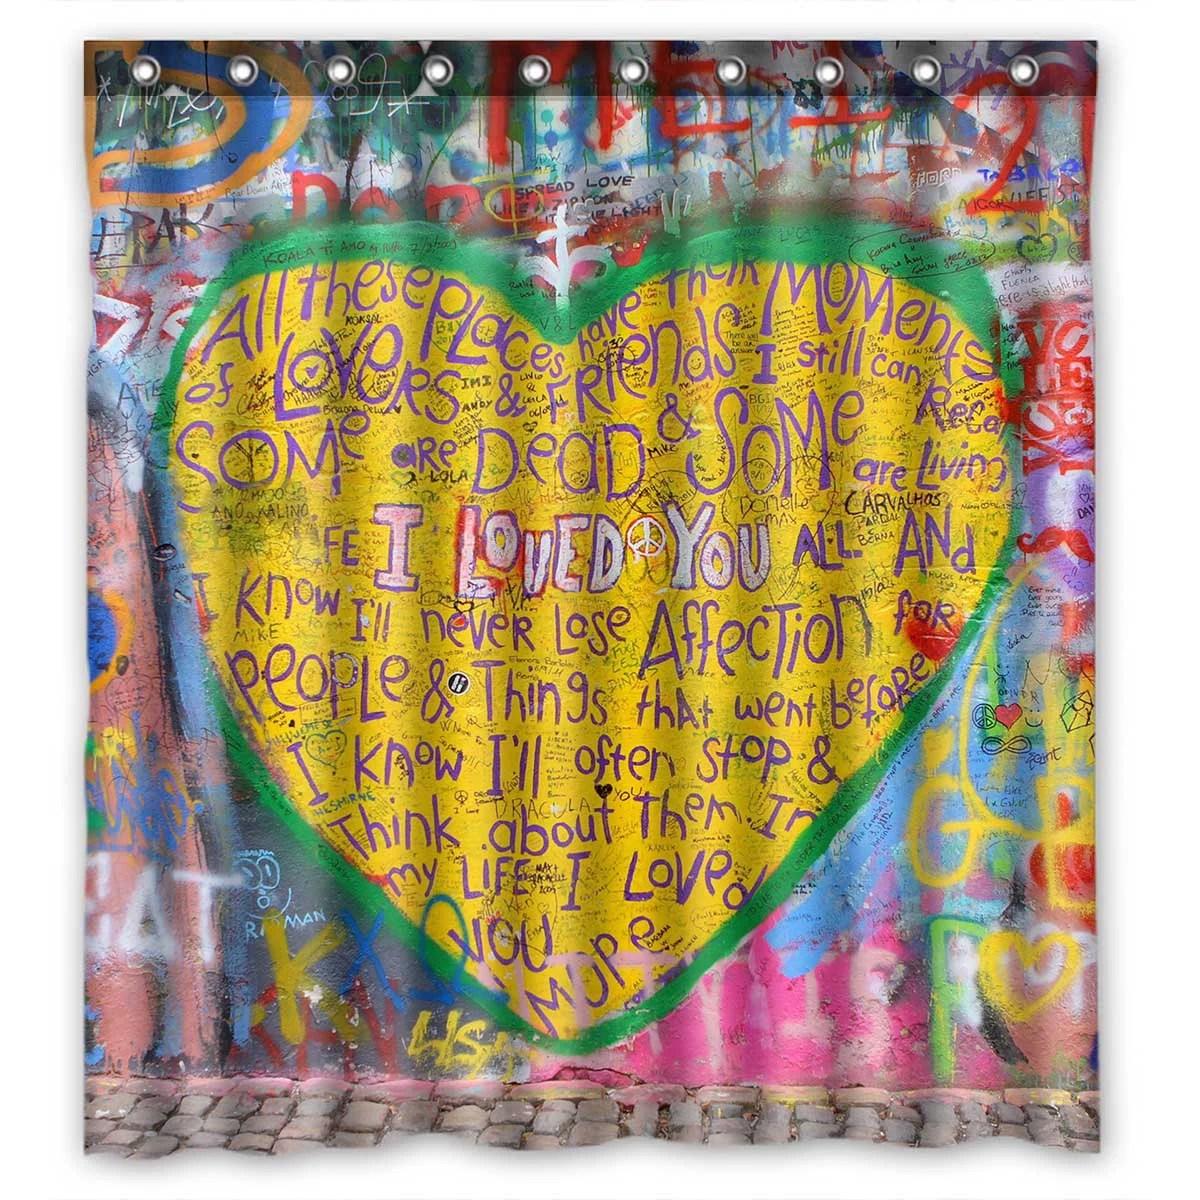 pkqwtm john lennon graffiti lyrics from beatles songs waterproof polyester fabric shower curtain size 66x72 inches